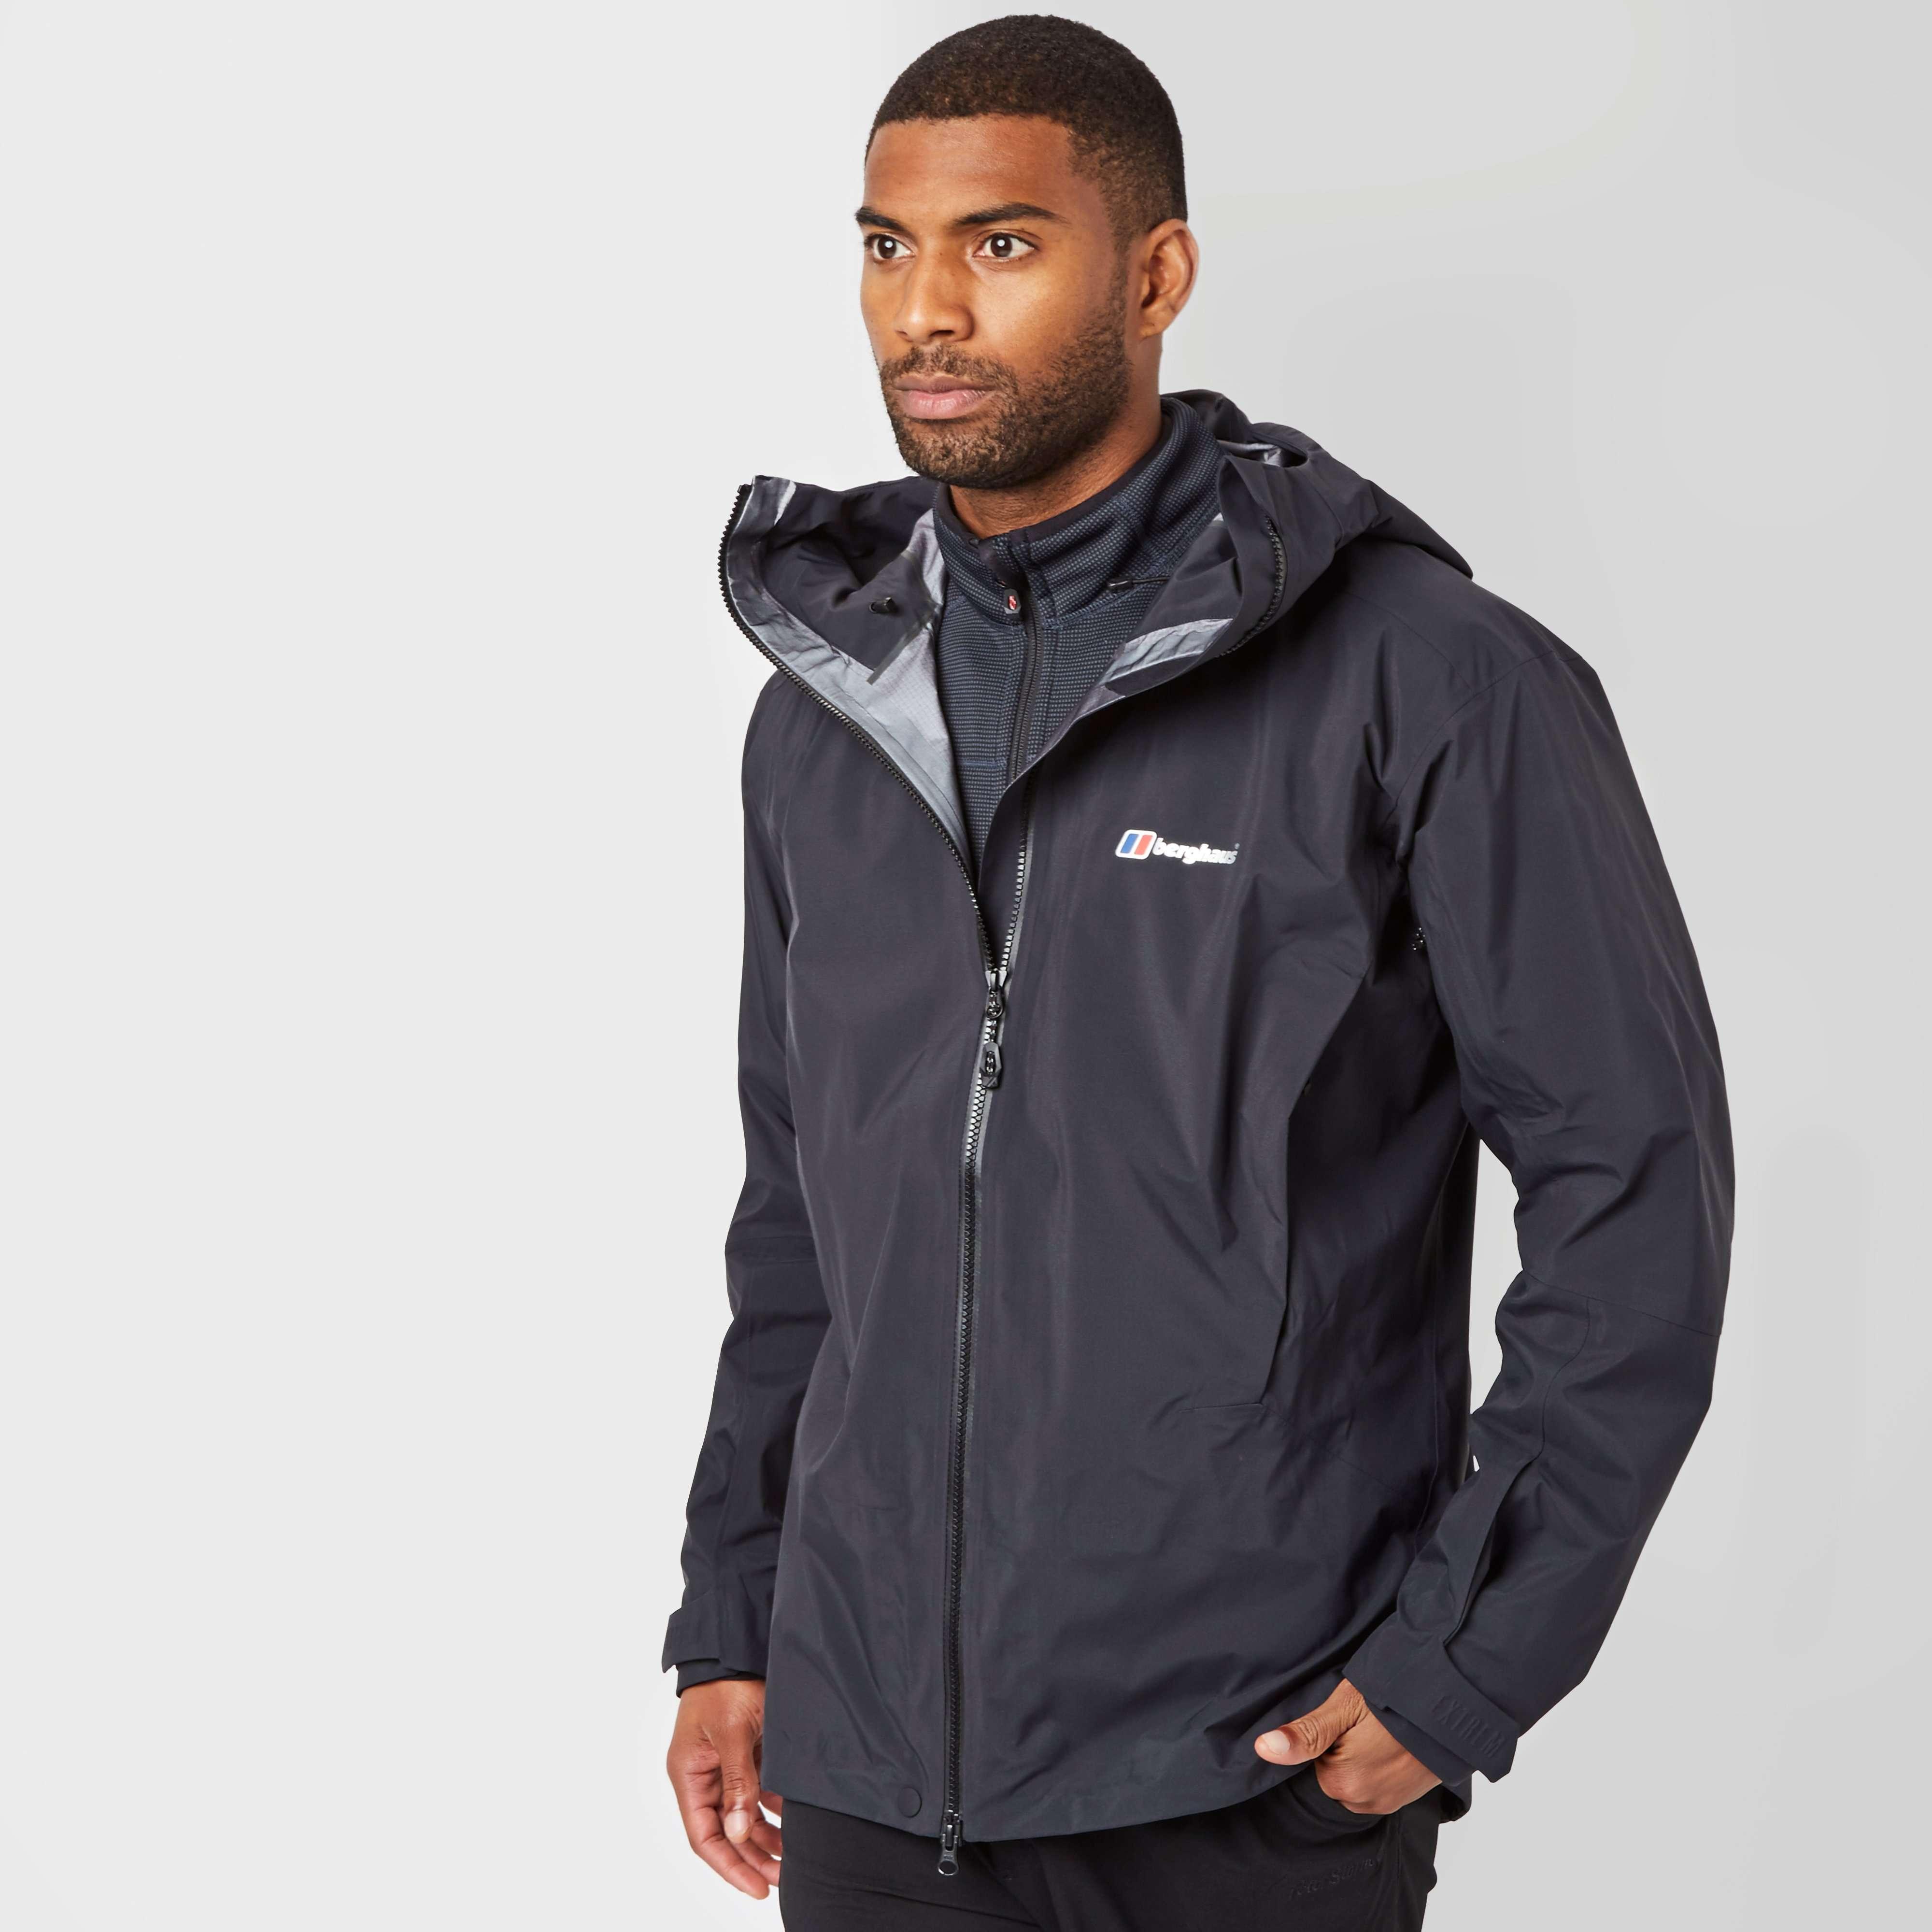 BERGHAUS Men's Extrem 7000 Pro GORE-TEX® Jacket